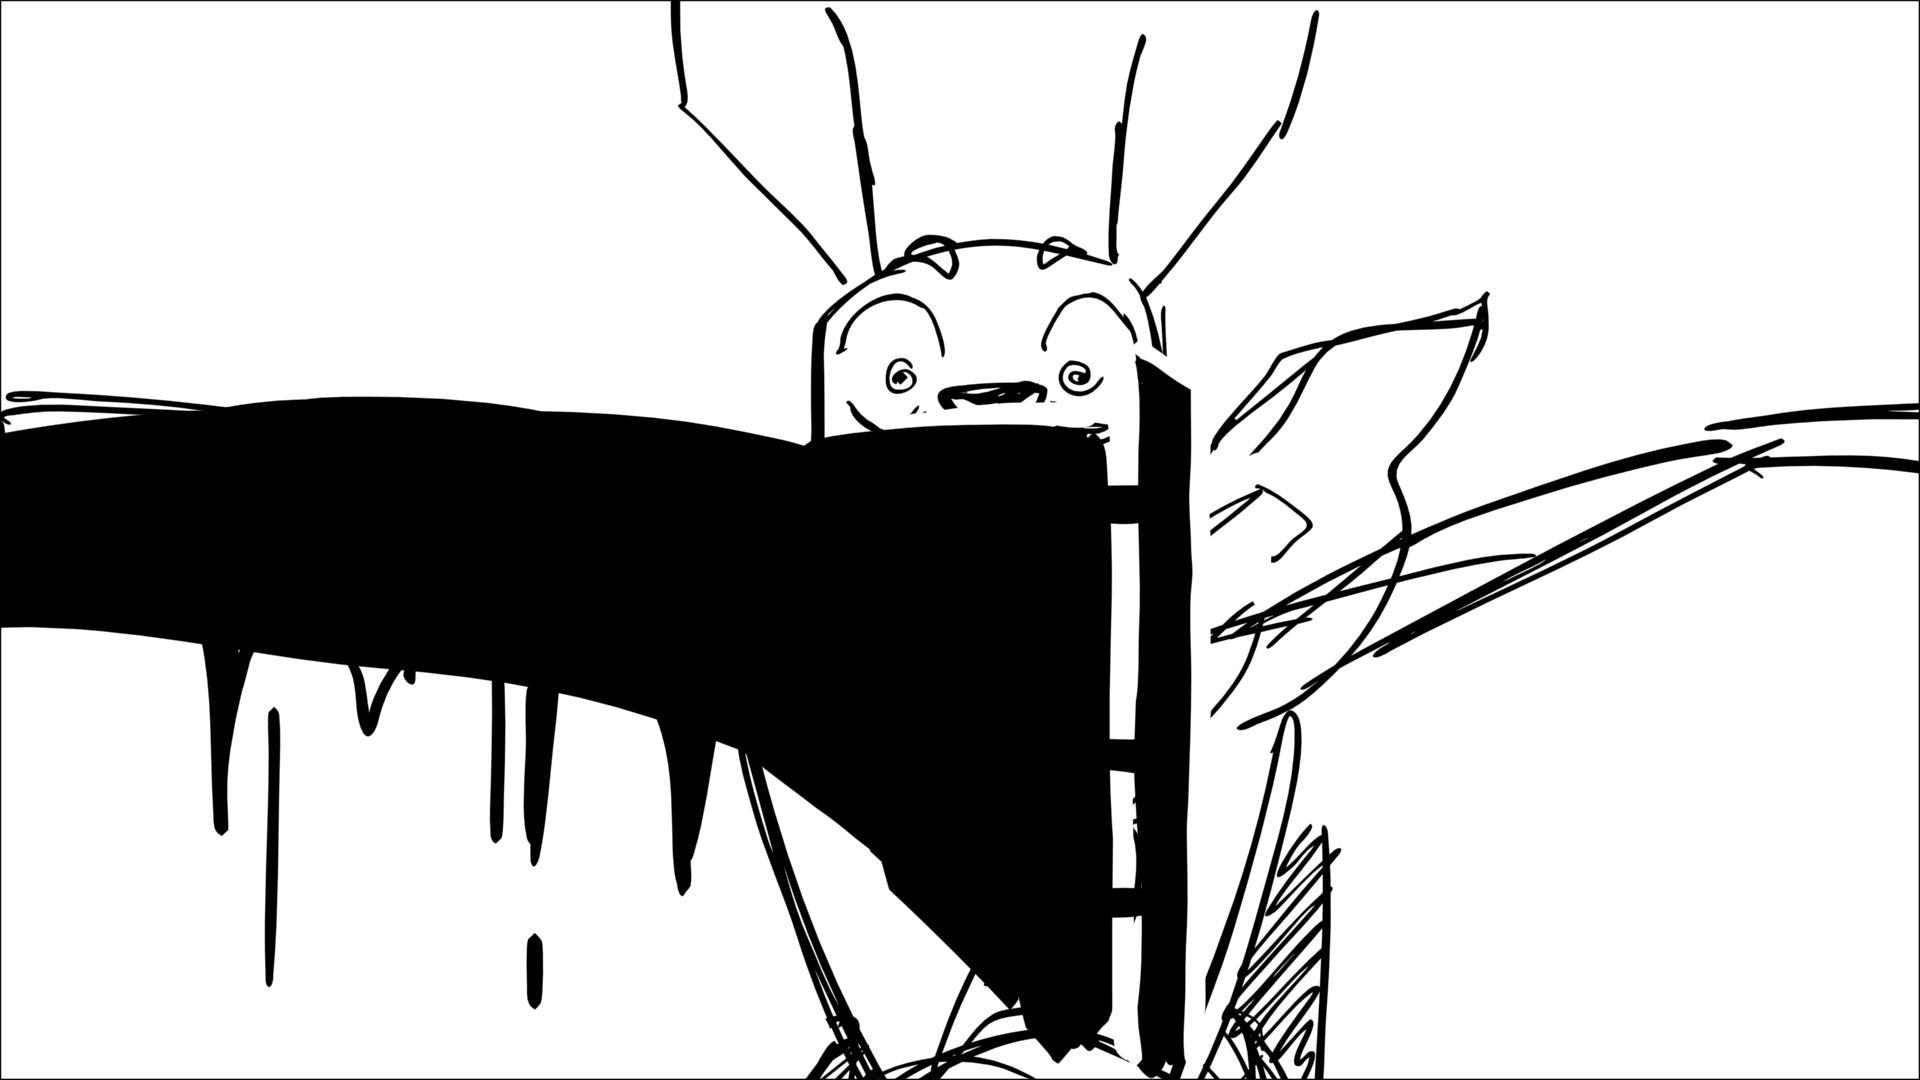 Blades of Furry-000063-02.jpg